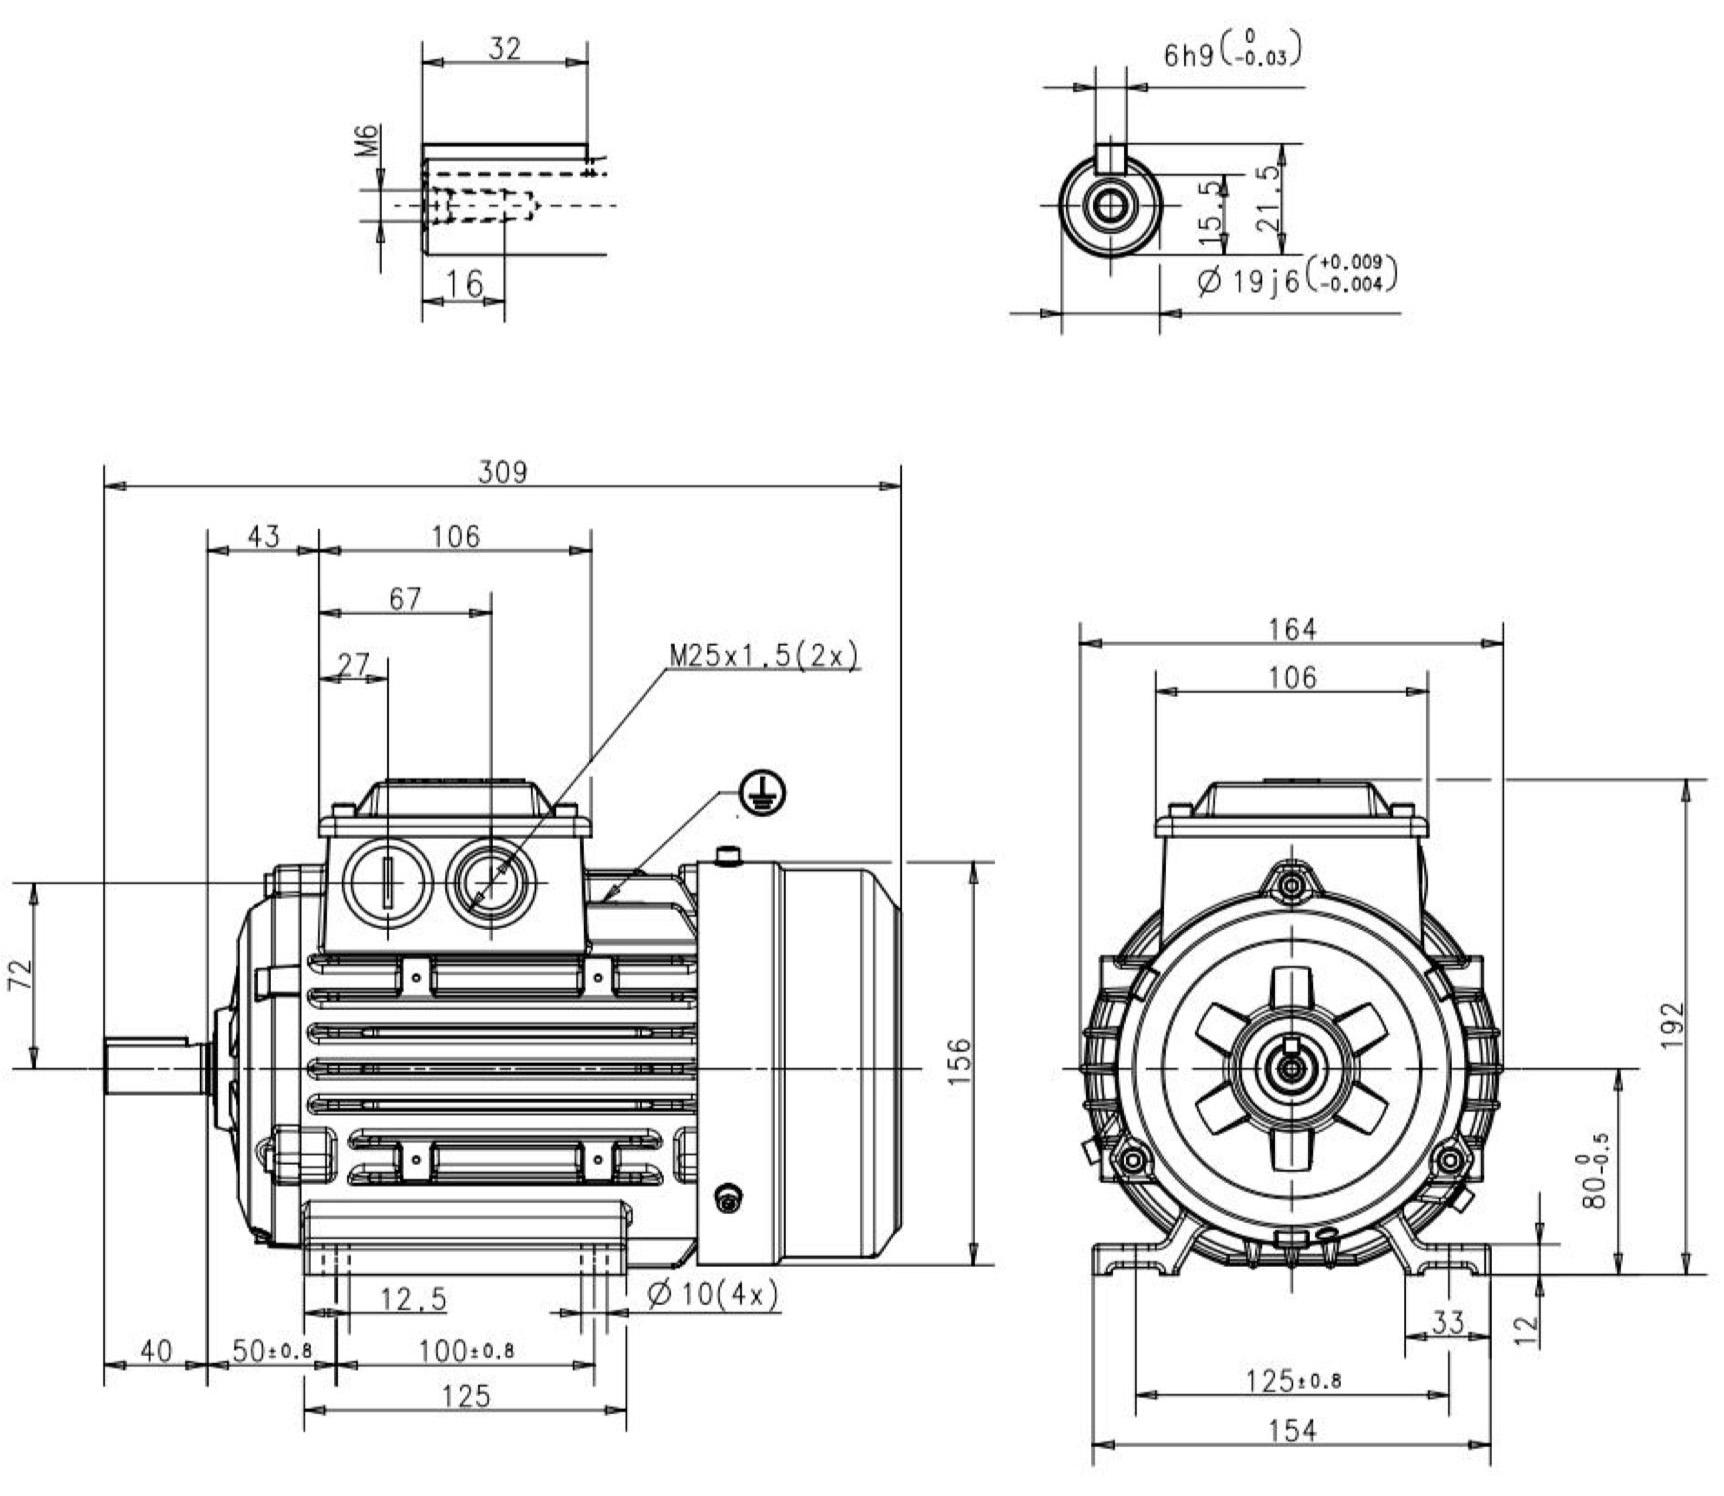 moteur triphas u00e9 0 55 kw  1500 tr  min  b3  230  400v